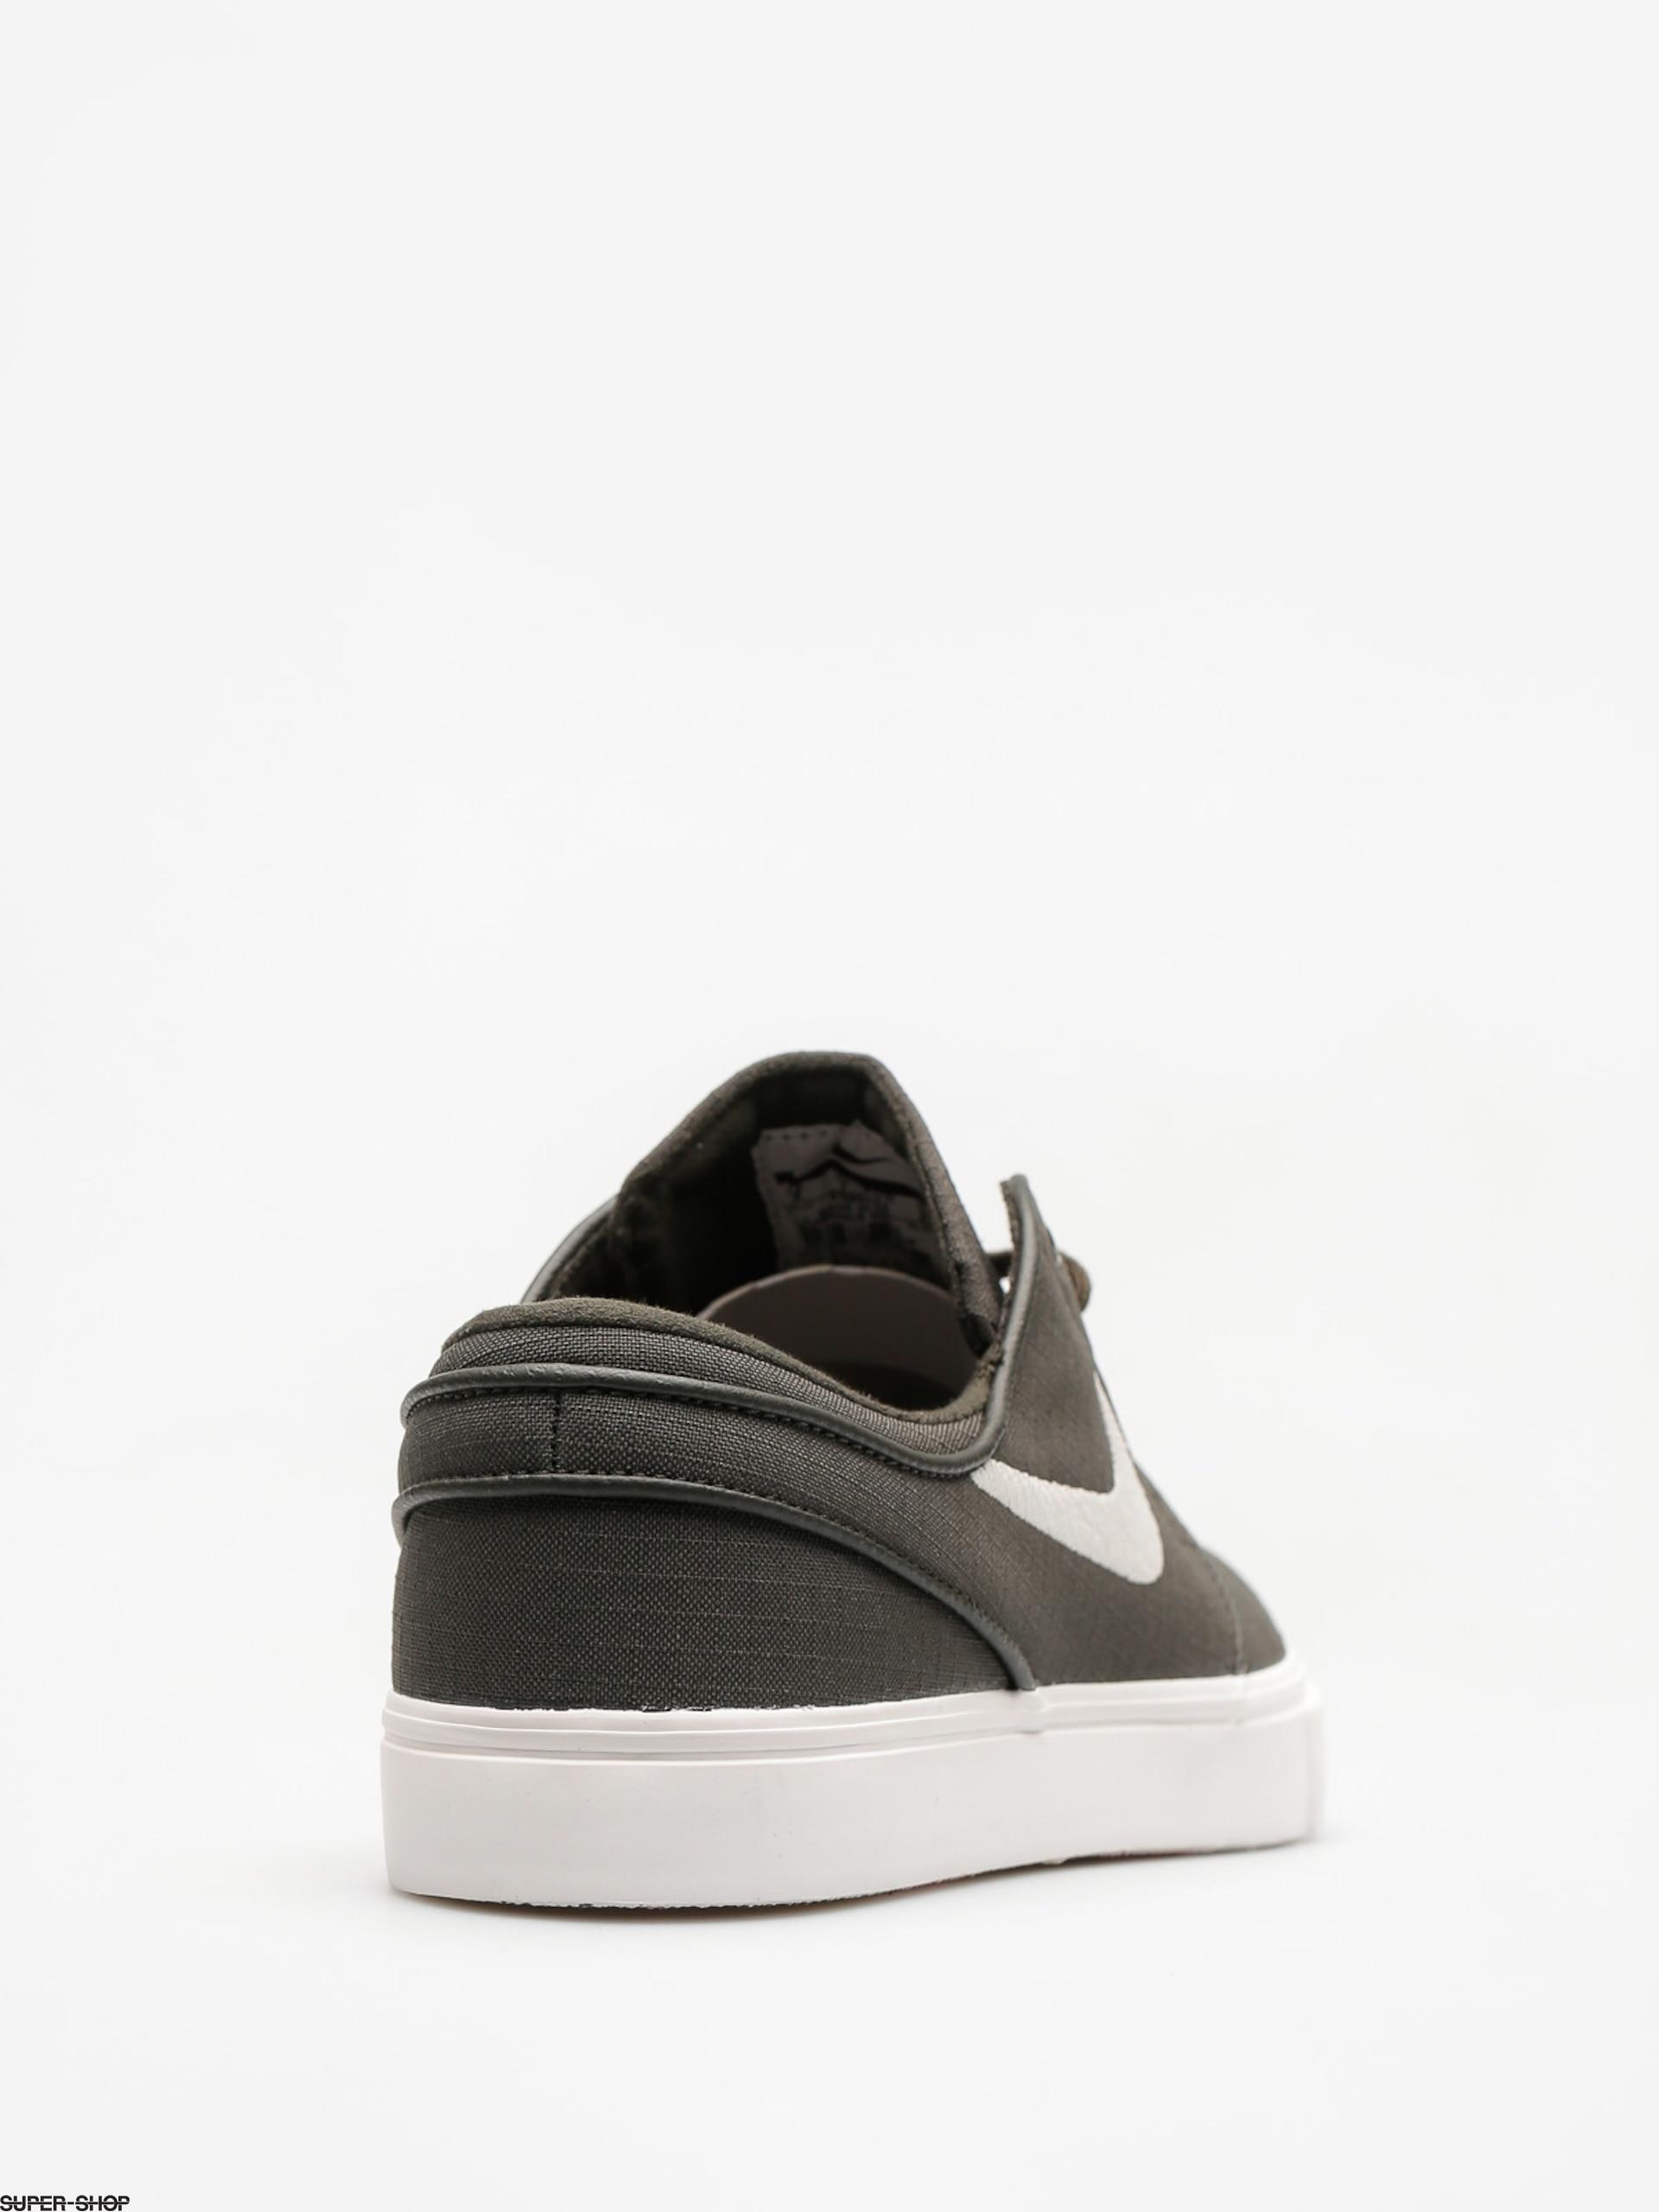 testigo Saludo Ciudad  Nike SB Shoes Zoom Stefan Janoski Cnvs (sequoia/light bone summit white)